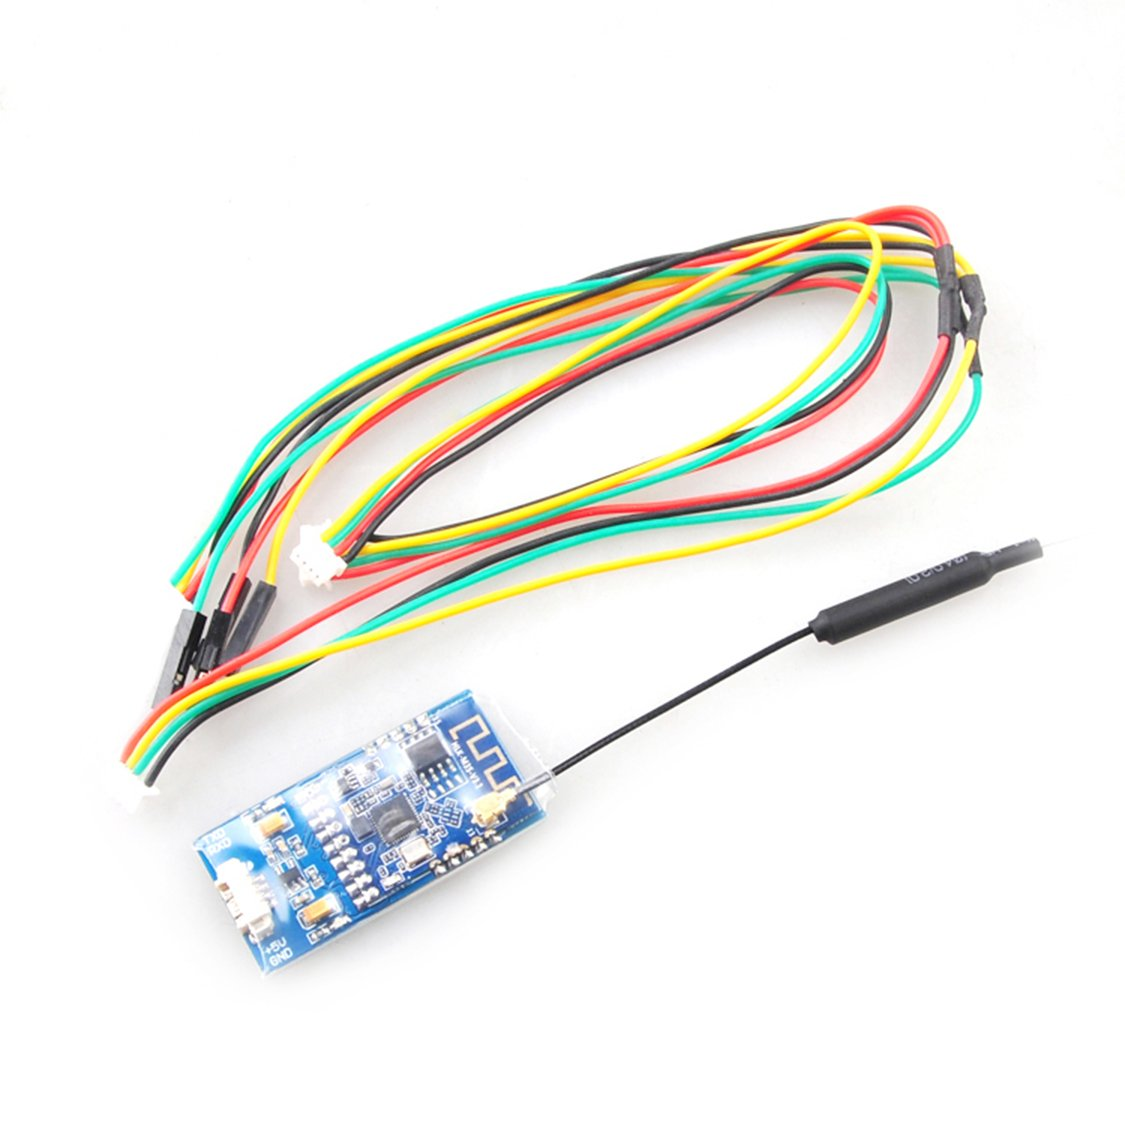 jrelecs APM Pixhawk Wireless WiFi Module Replacement of 3DR Radio Telemetry